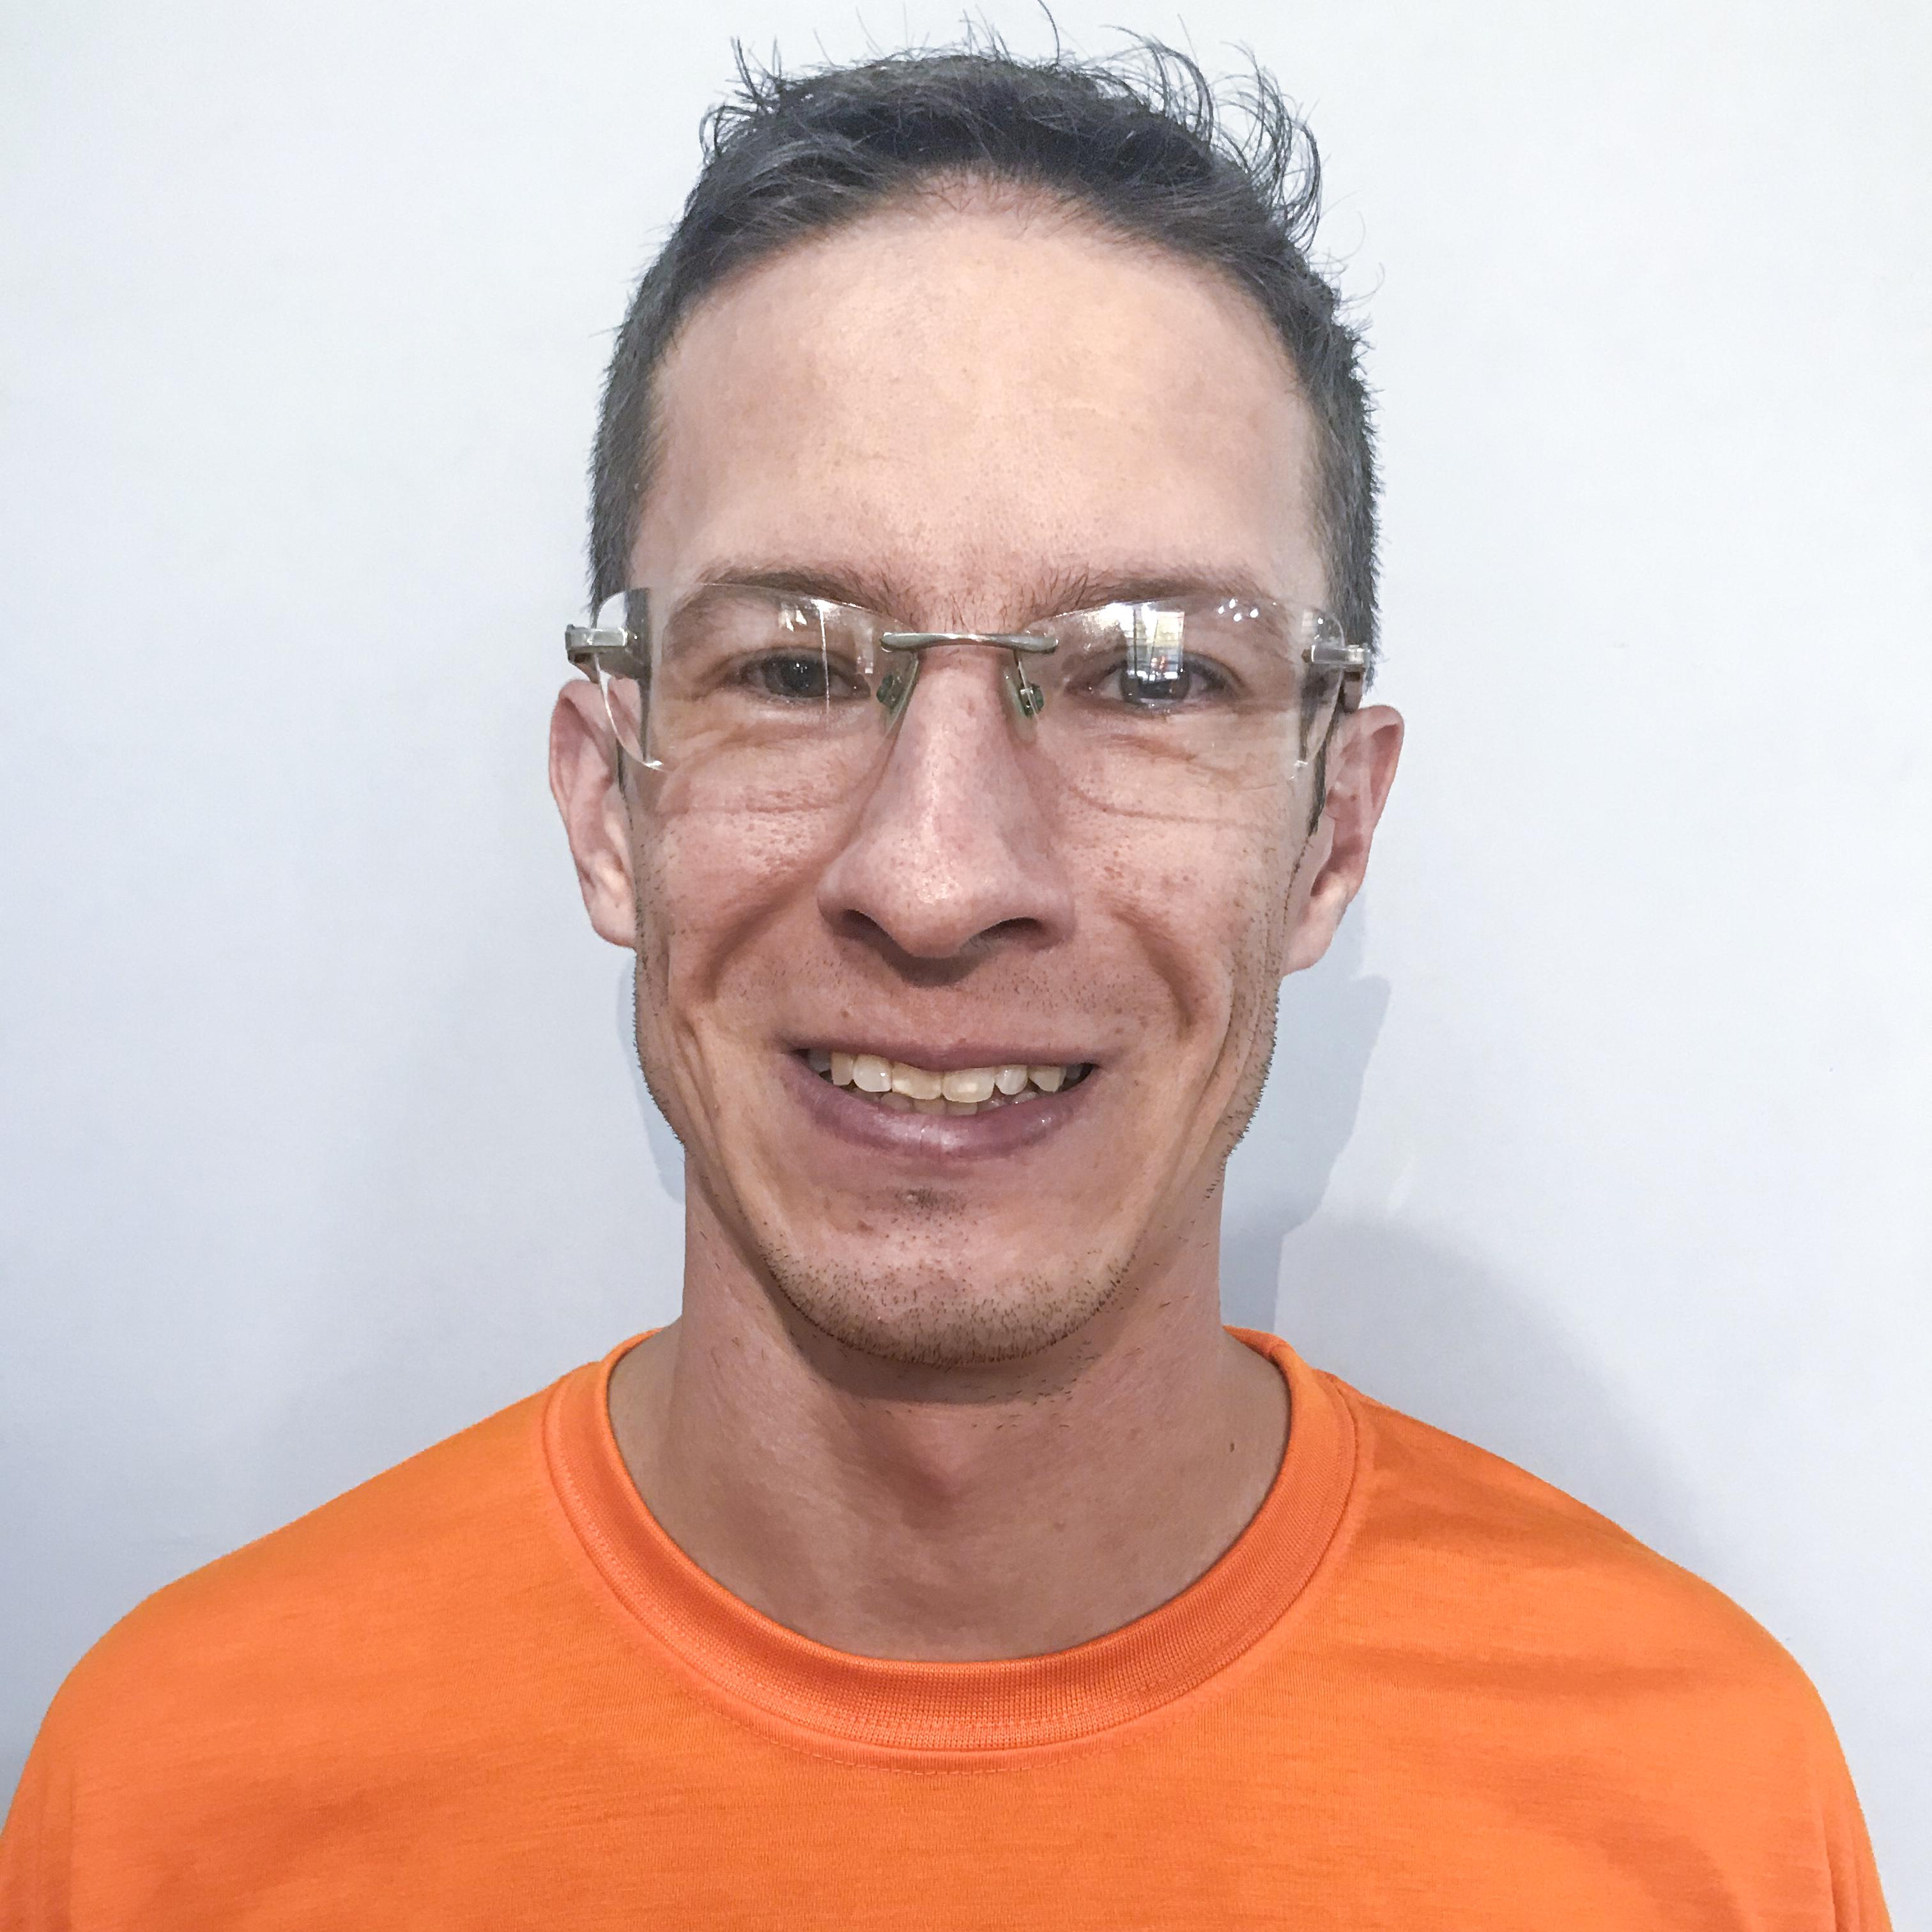 Profissional Israel Ribeiro Batista